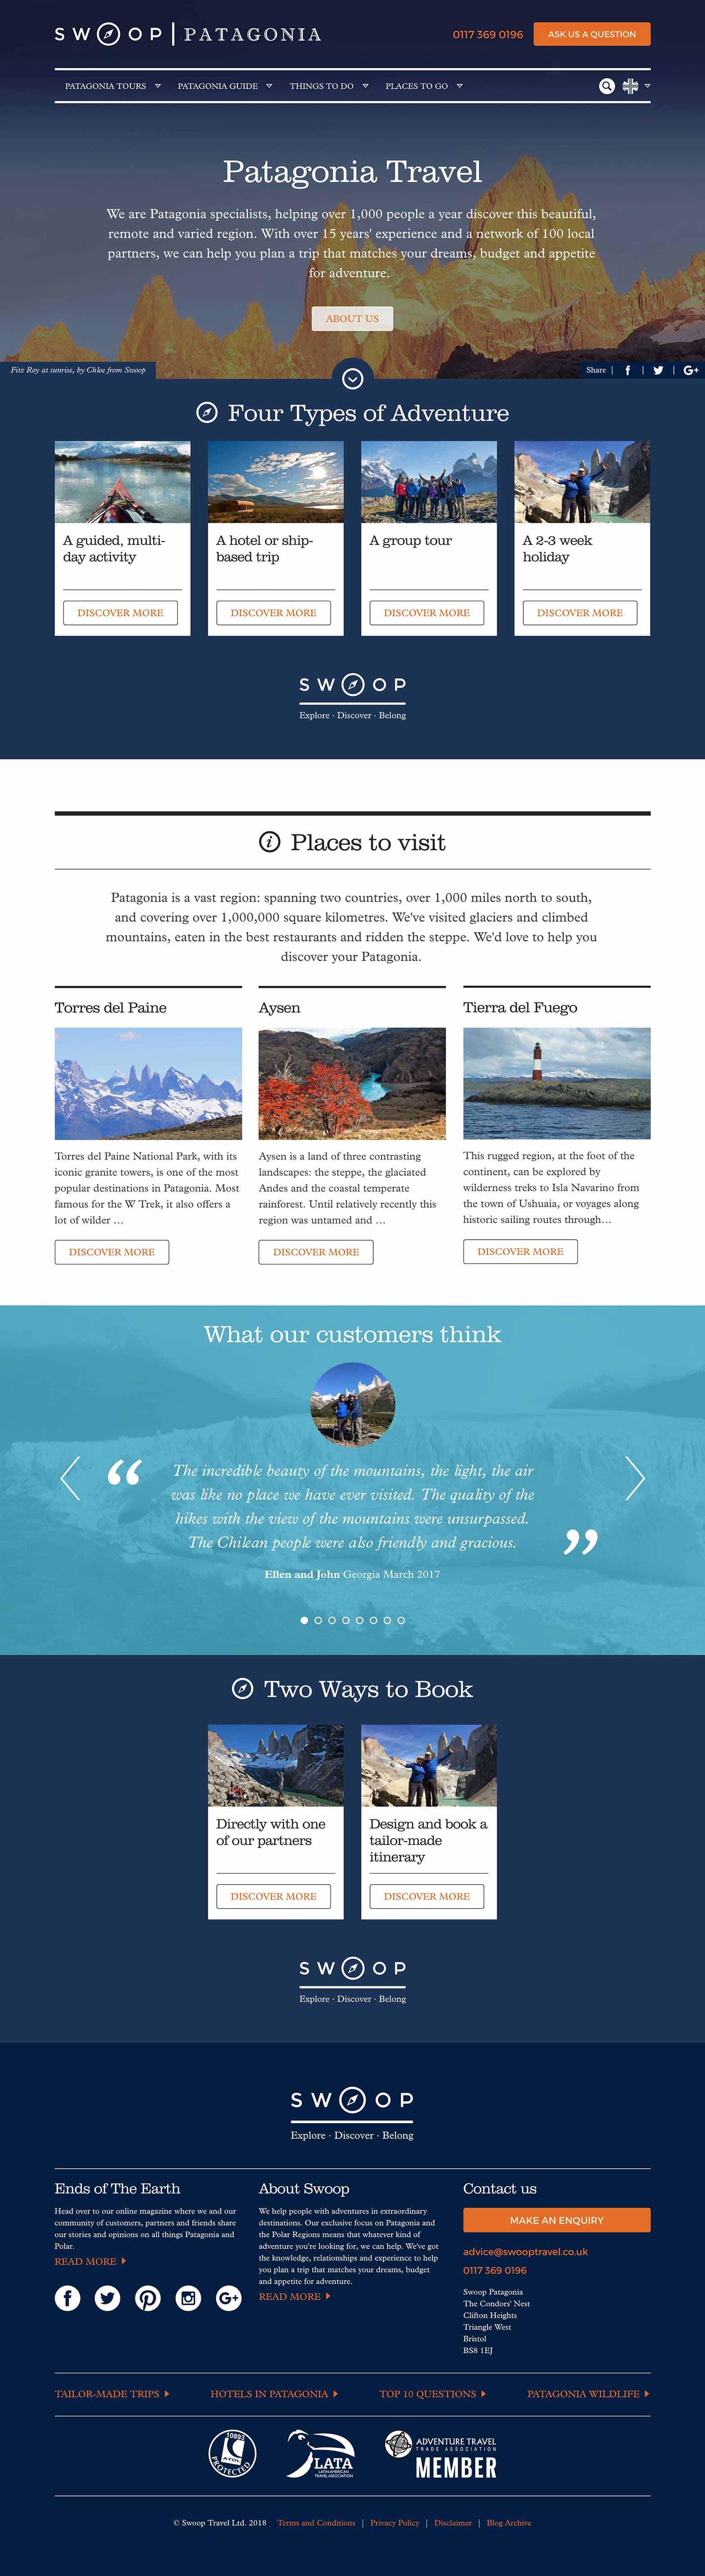 Ember web design work - Swoop Travel Custom CRM, ERP and website development